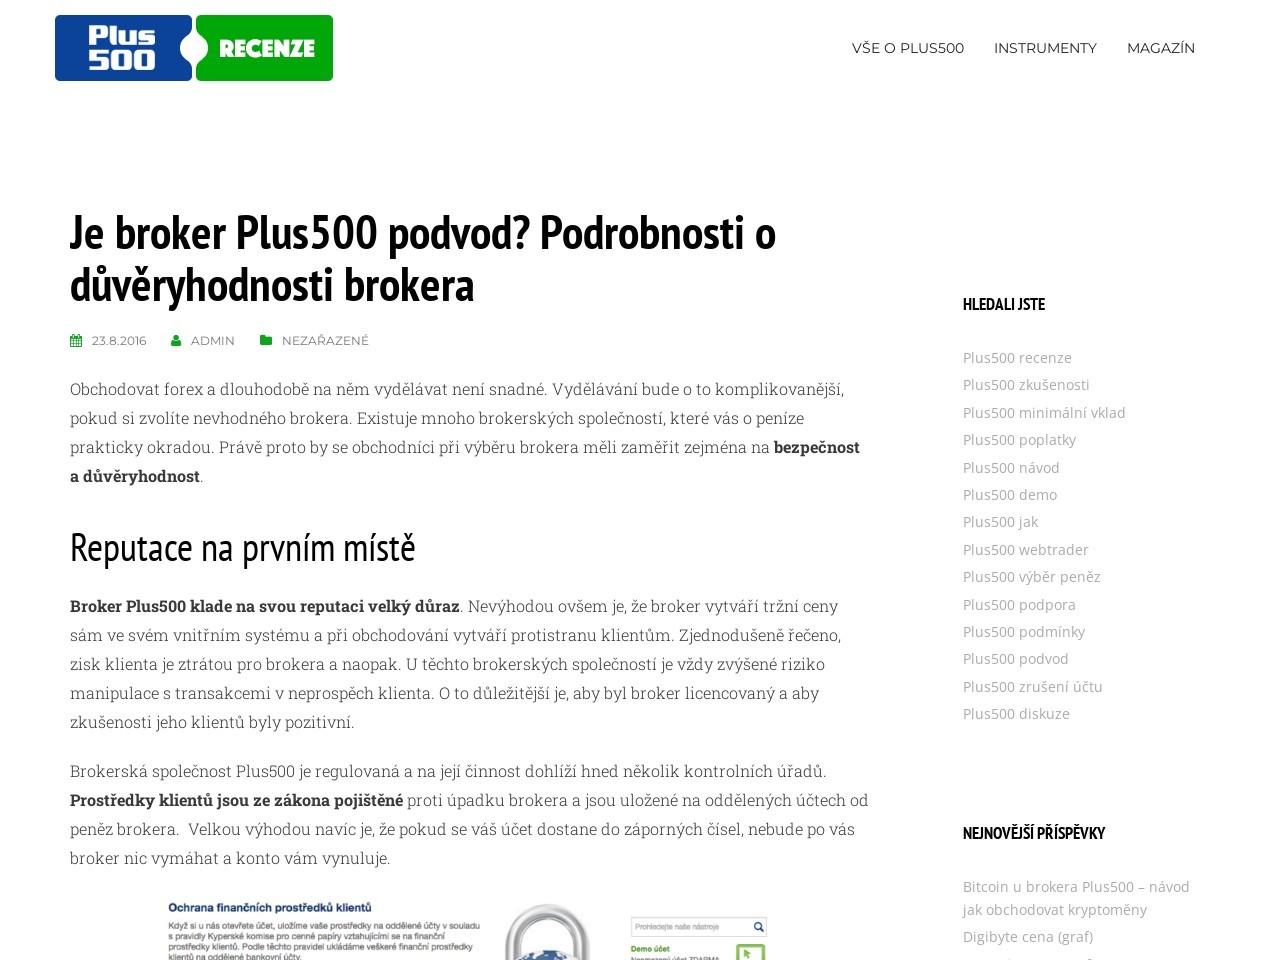 Je broker Plus500 podvod? Podrobnosti o důvěryhodnosti brokera (Zdroj: Wordpress.com)